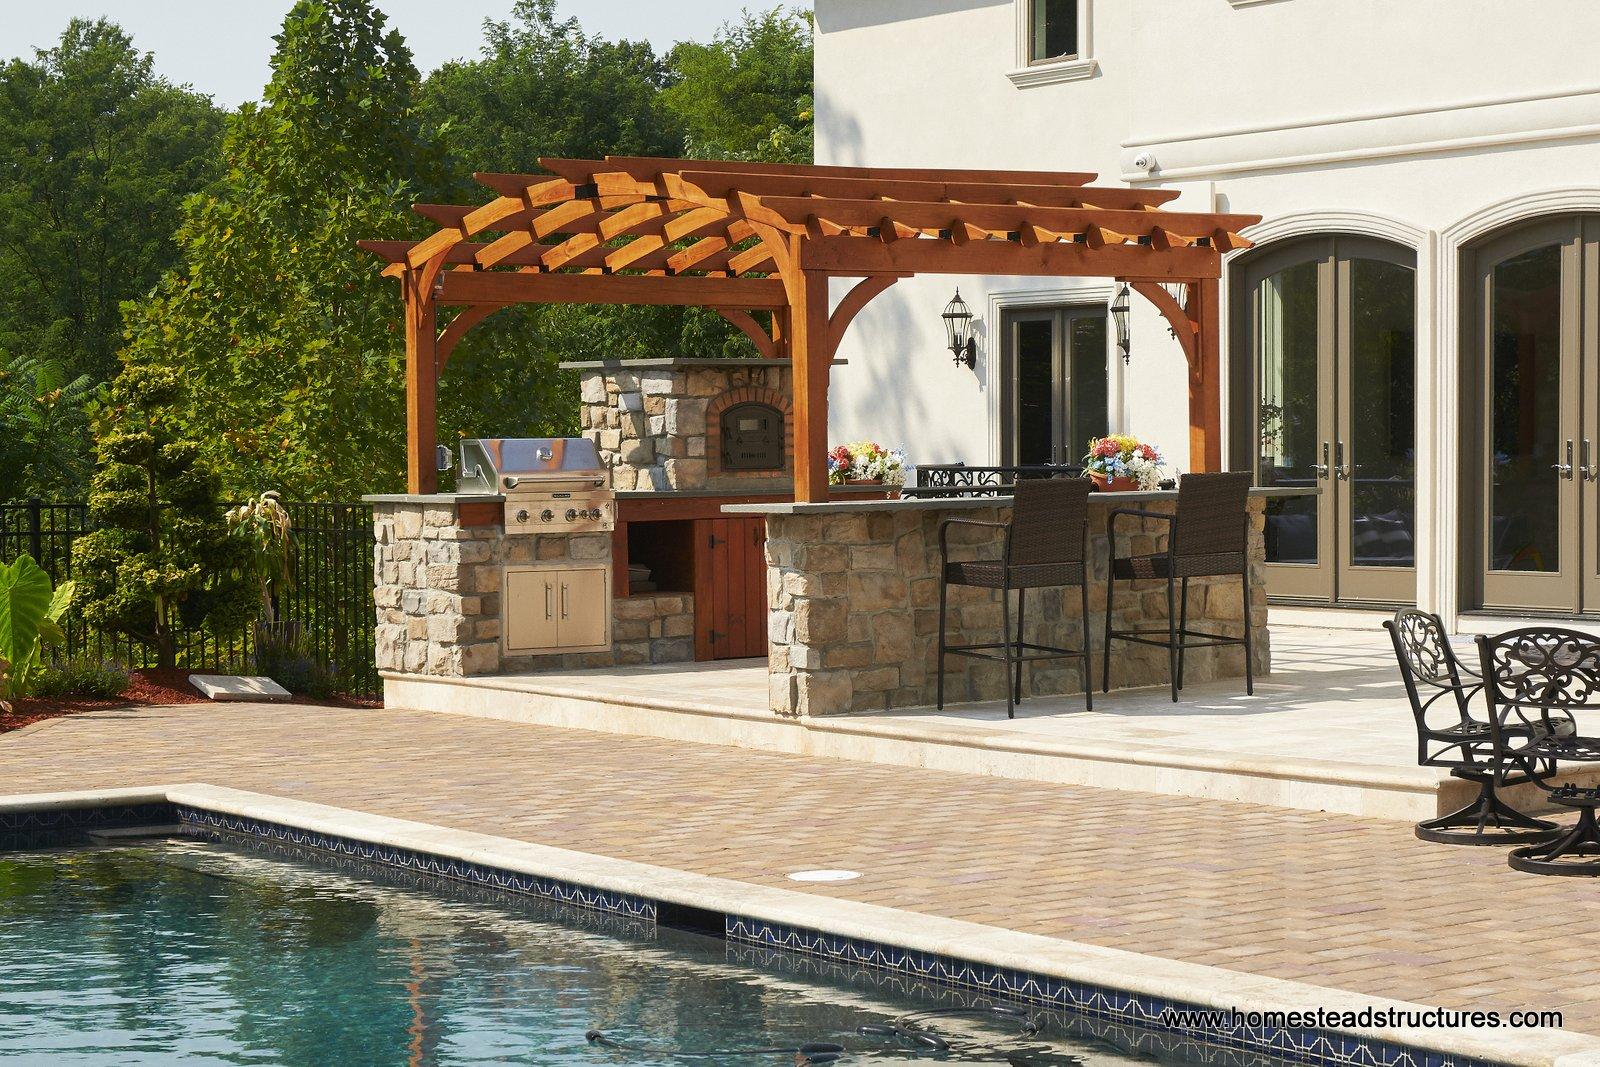 Excellent Custom Vinyl Wood Pergolas For Patio Garden Homestead Download Free Architecture Designs Scobabritishbridgeorg